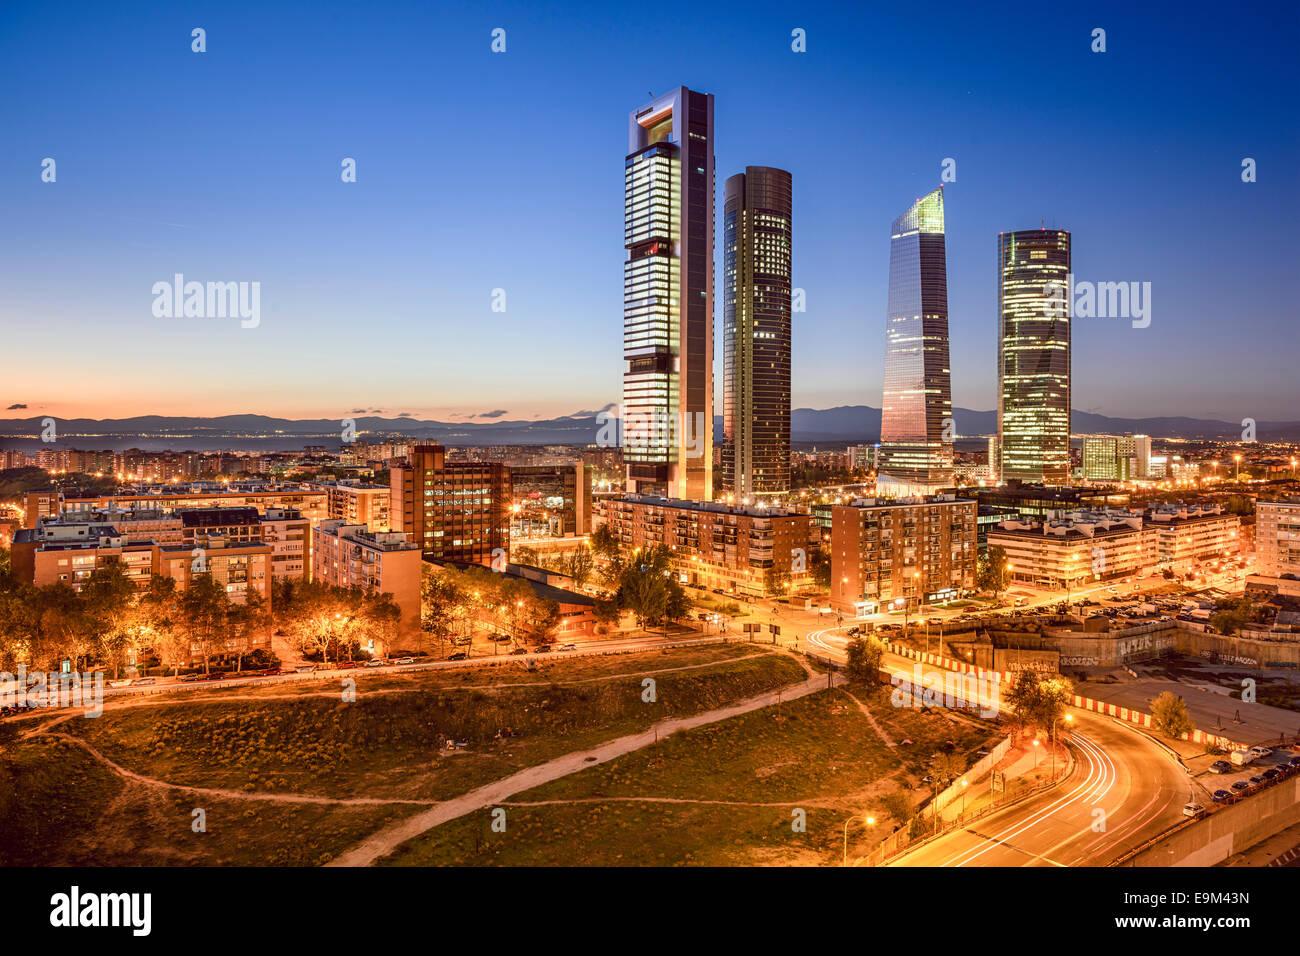 Madrid, España distrito financiero skyline en penumbra. Imagen De Stock